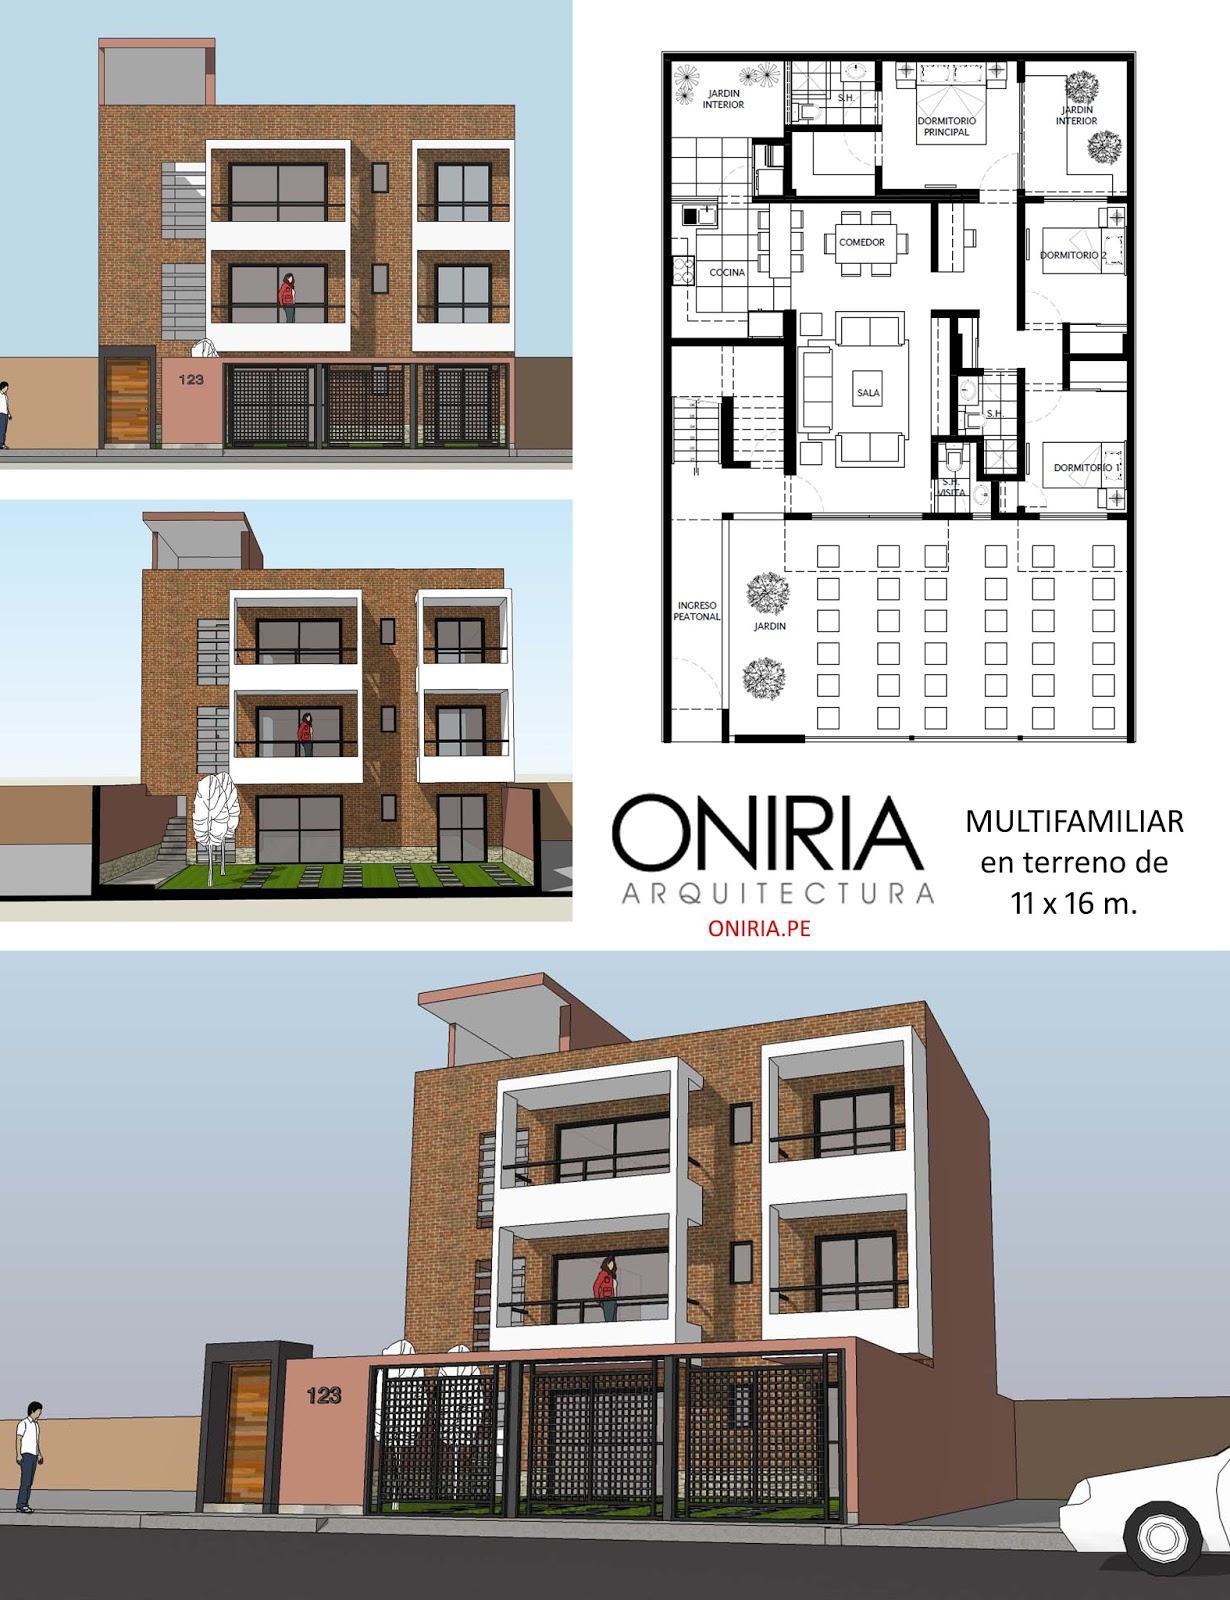 Cristian campos dise o de vivienda multifamiliar en for Diseno de casa de 5 x 10